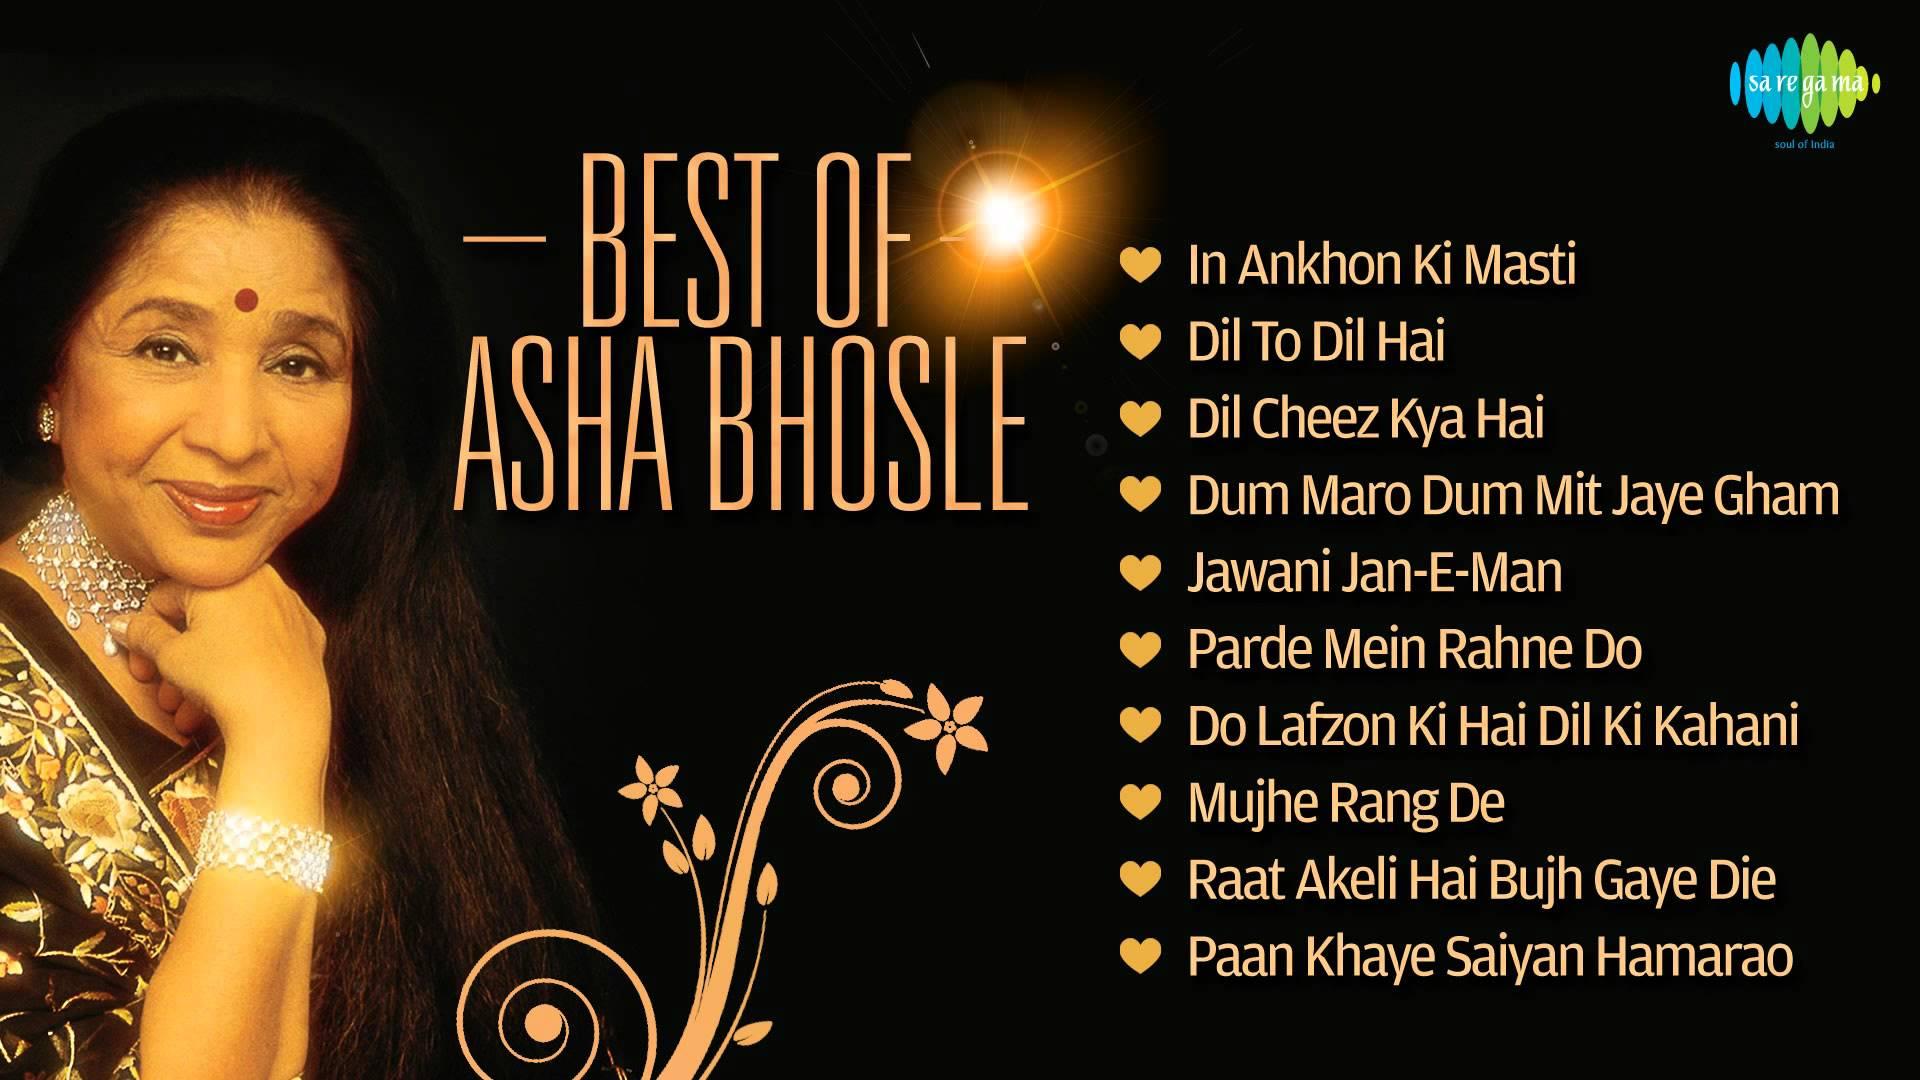 8th september 1933 asha bhosle born film bio asha bhosle nvjuhfo Choice Image